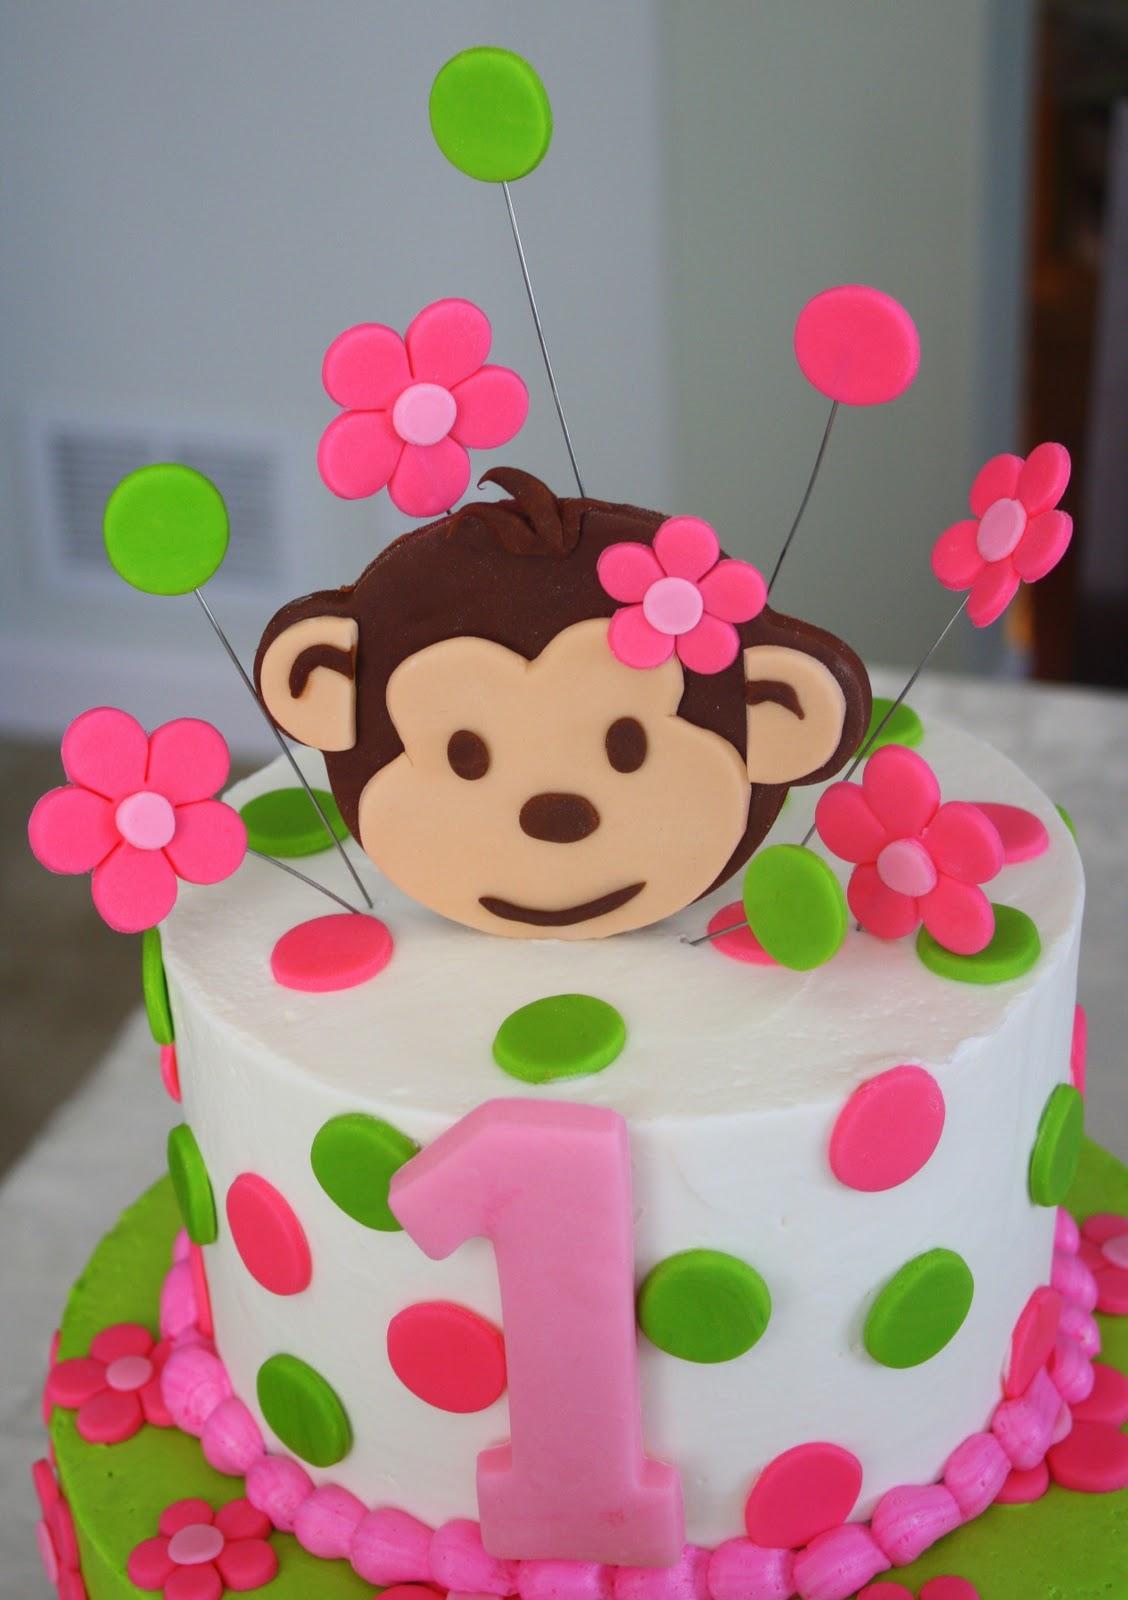 Incredible 11 Pink Mod Monkey Cakes Photo Pink Mod Monkey 1St Birthday Cake Funny Birthday Cards Online Kookostrdamsfinfo